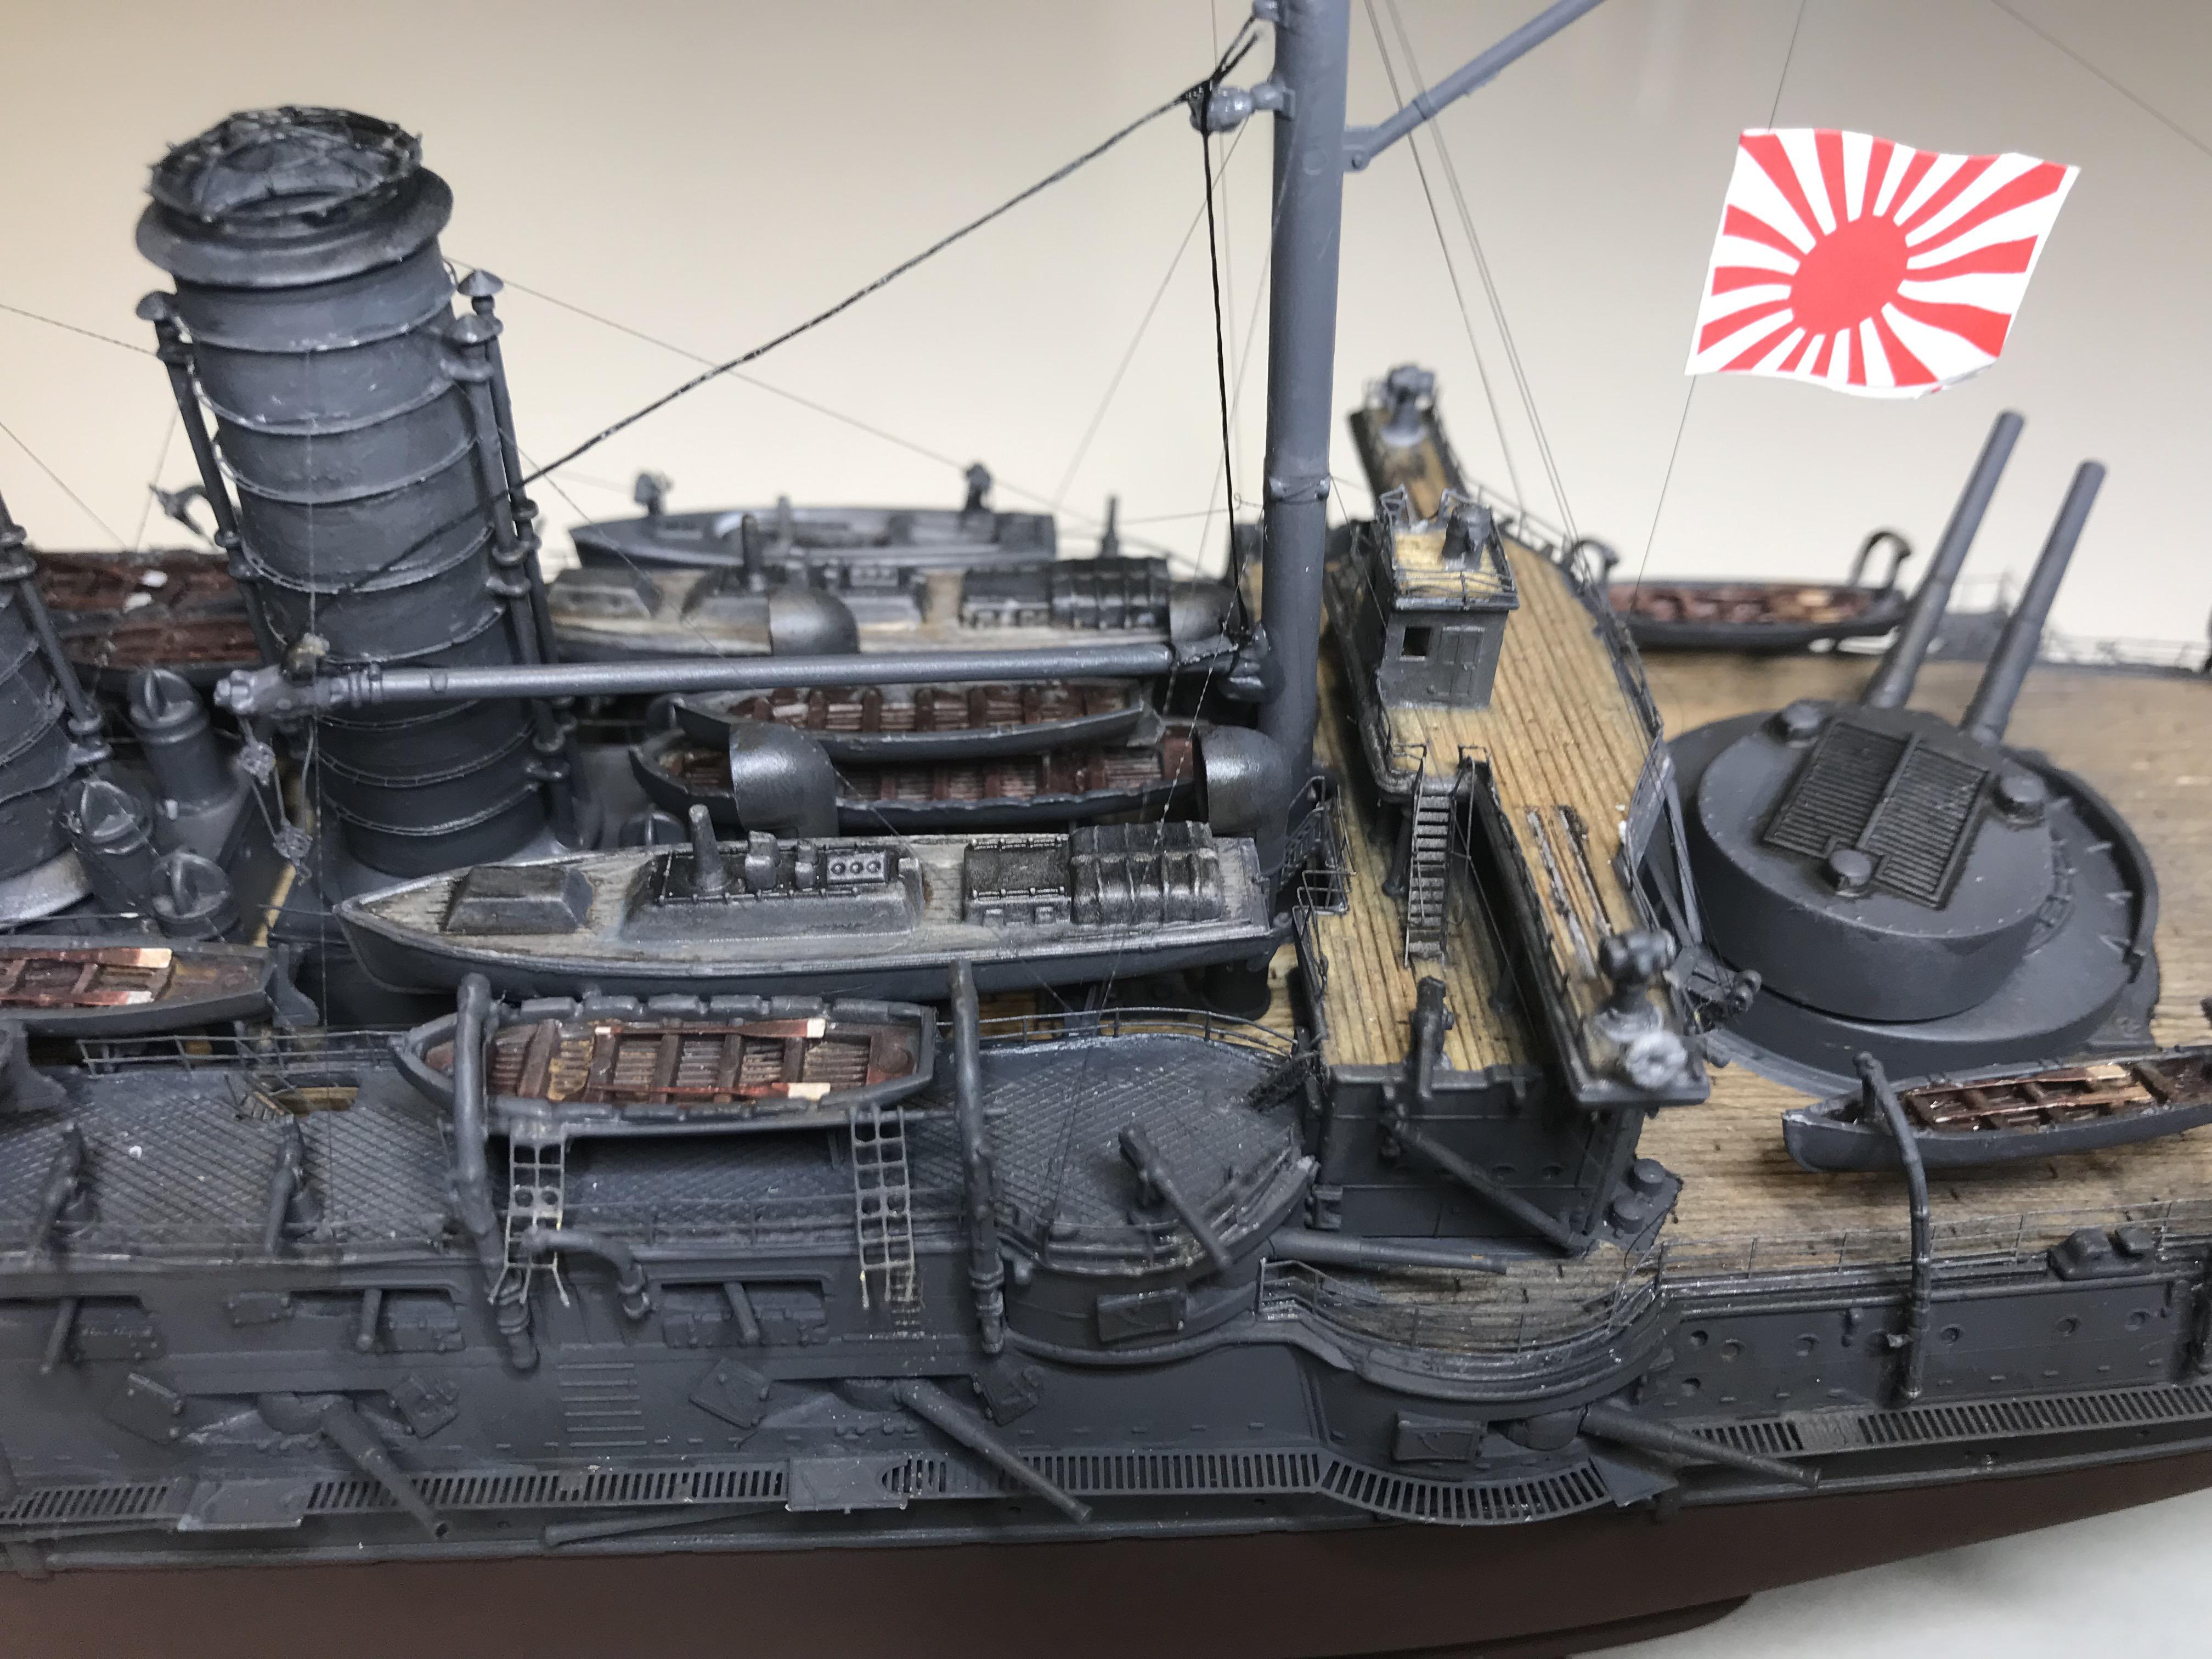 IJN MIKASA au 1/350 Hasagawa et PE Lion Roar 1563659751-img-0567